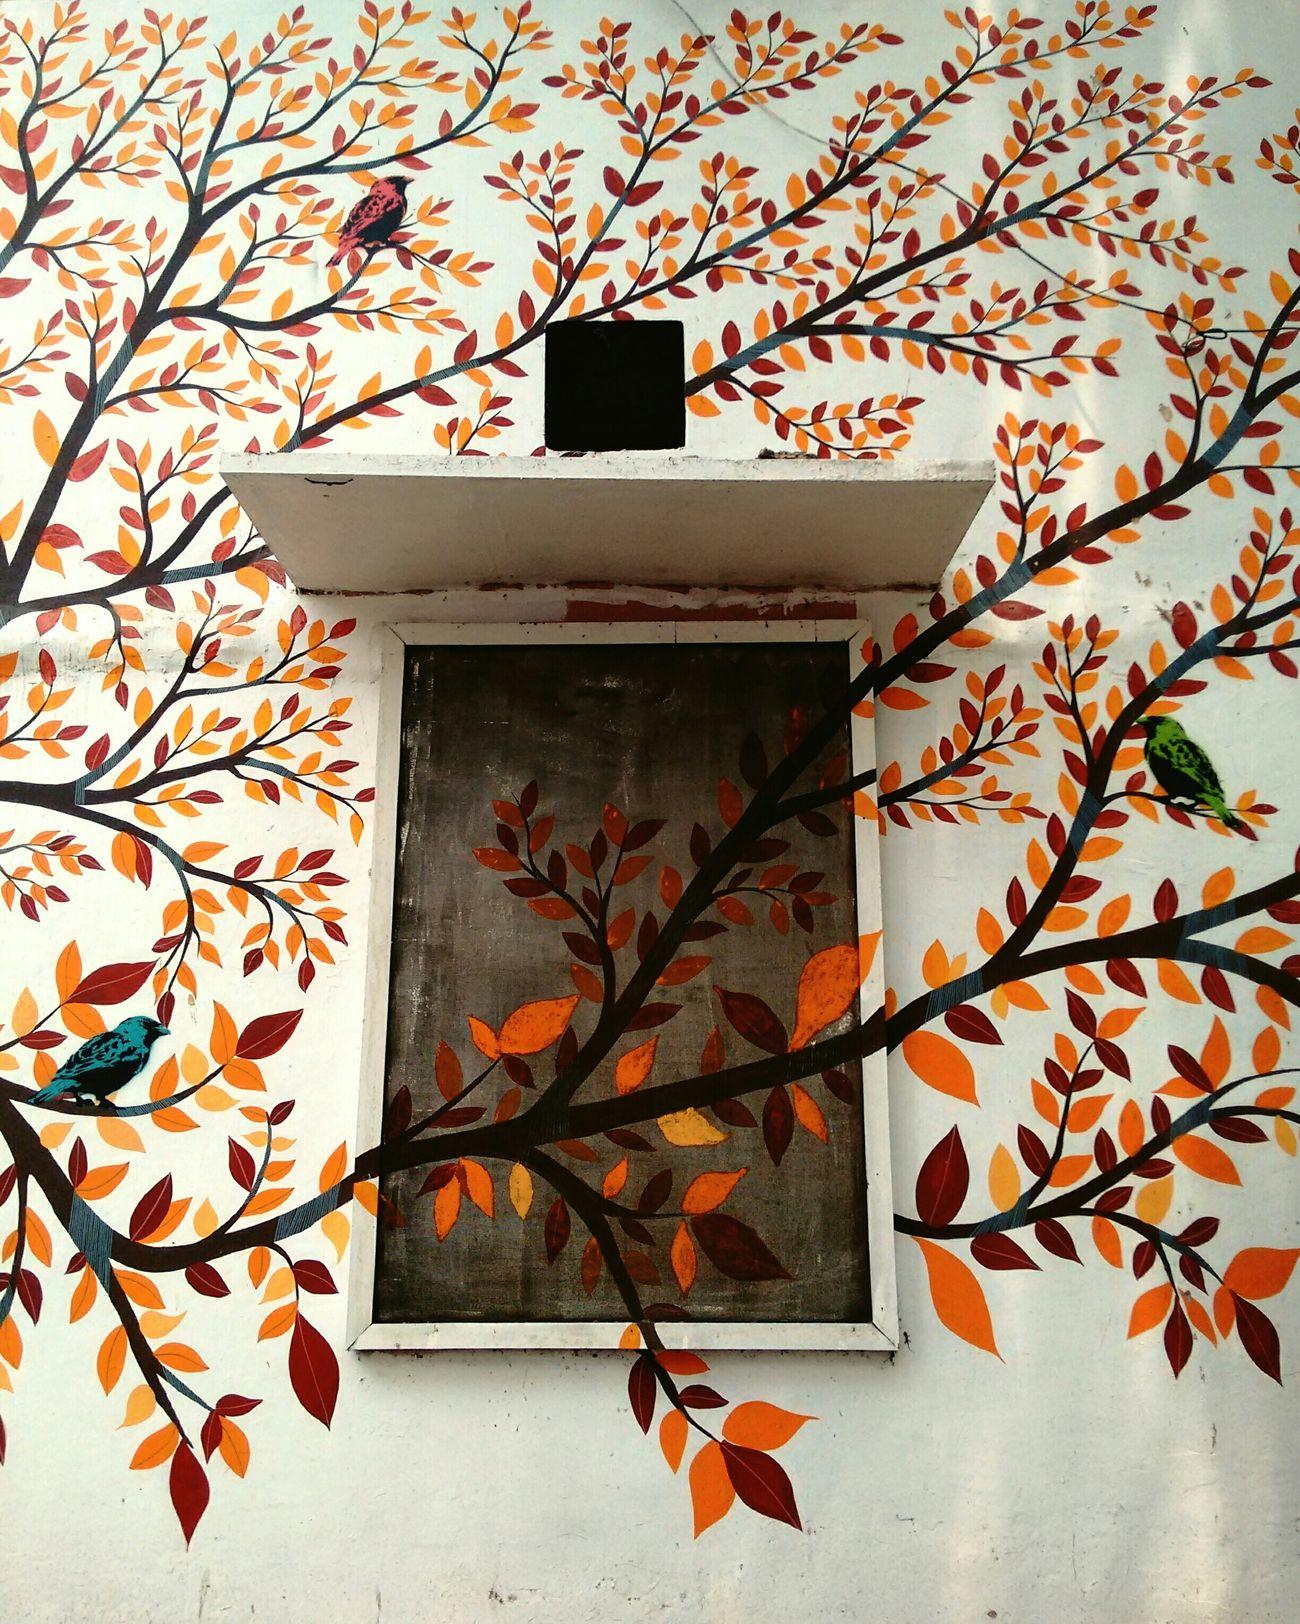 EyeEm Street Art Art Mural India Delhi Colors From My Point Of View EyeEm Best Shots DelhiGram Delhidiaries Streetphotography Lodhicolony Streets Of Delhi Wall Murals Folk Art  Details Colorful Mural Art Gond Art Window Wall Leaves Branches